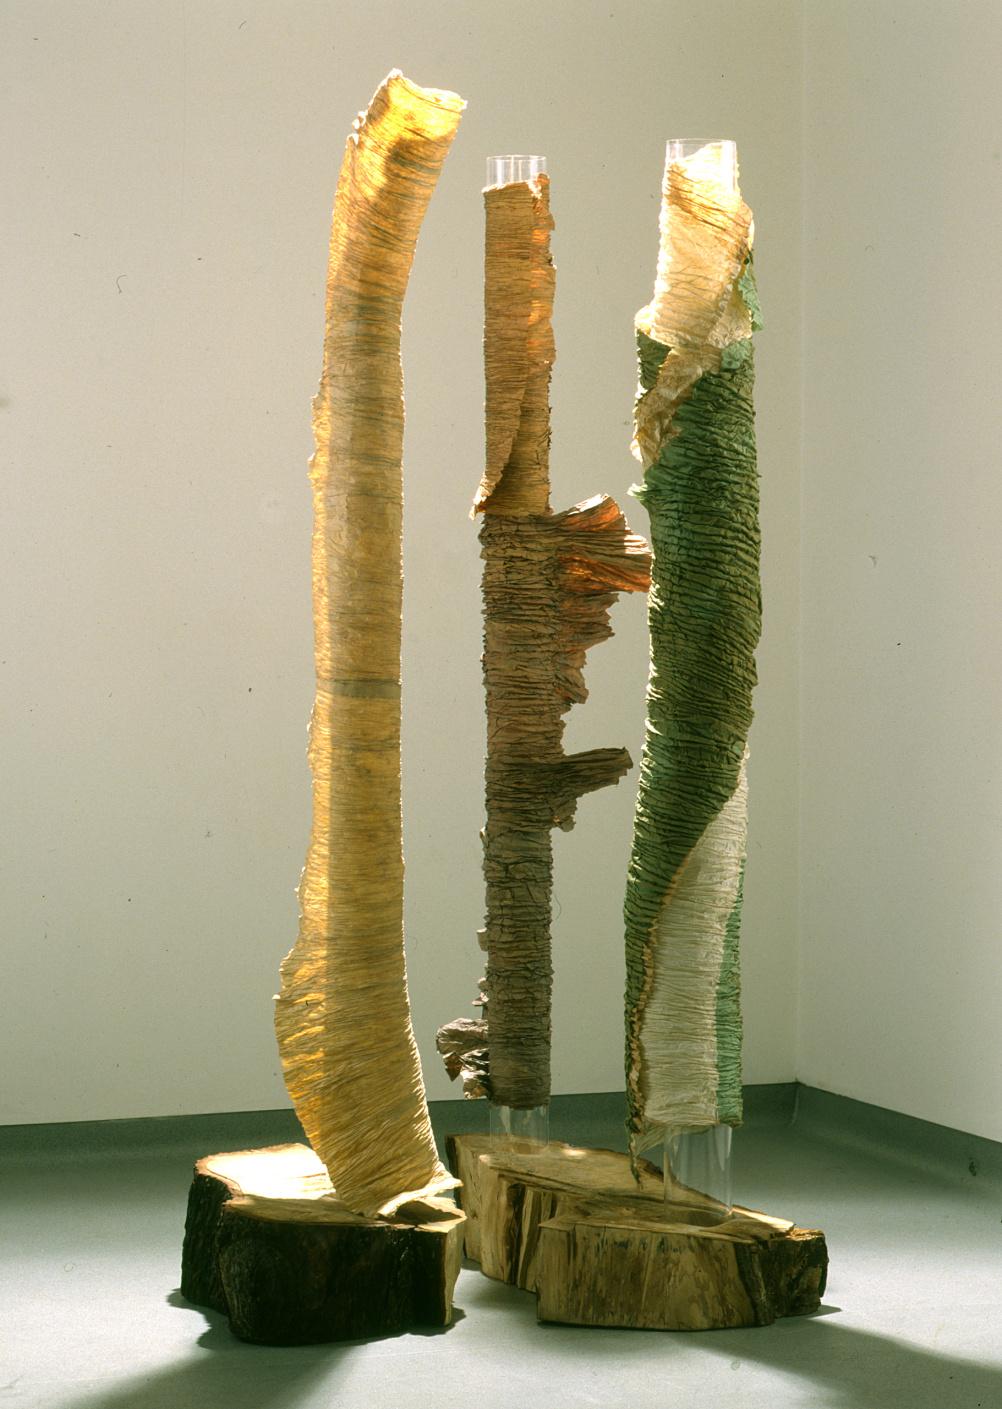 Maggie Bunzl, Three Sentiels 2007